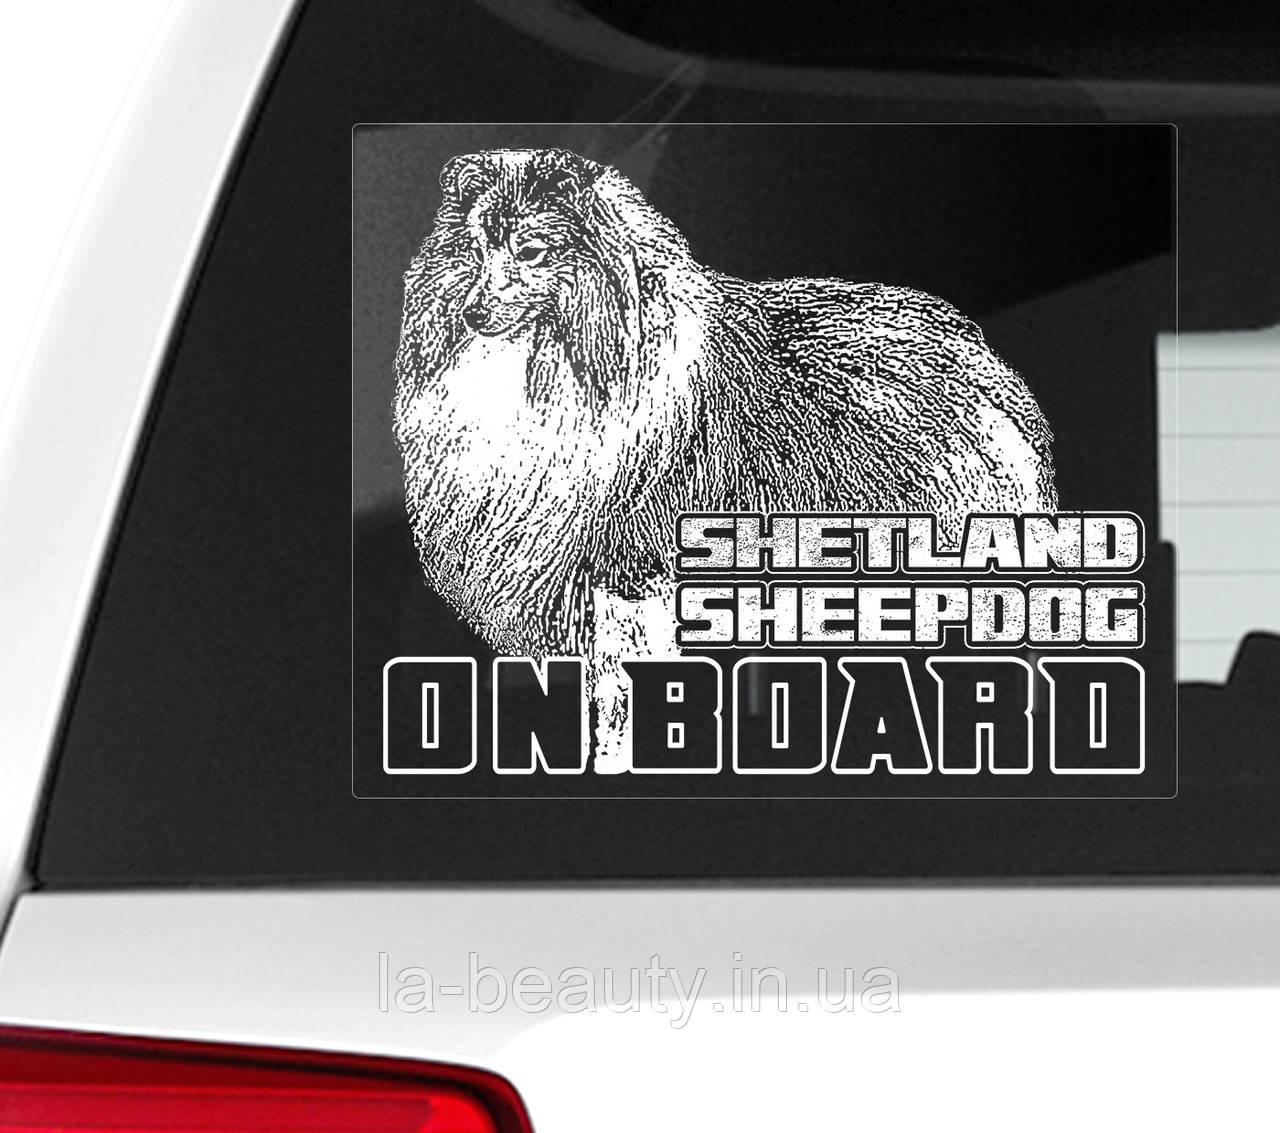 Наклейка на авто / машину Шетландская овчарка (шелти) на борту (Shetland Sheepdog On Board)